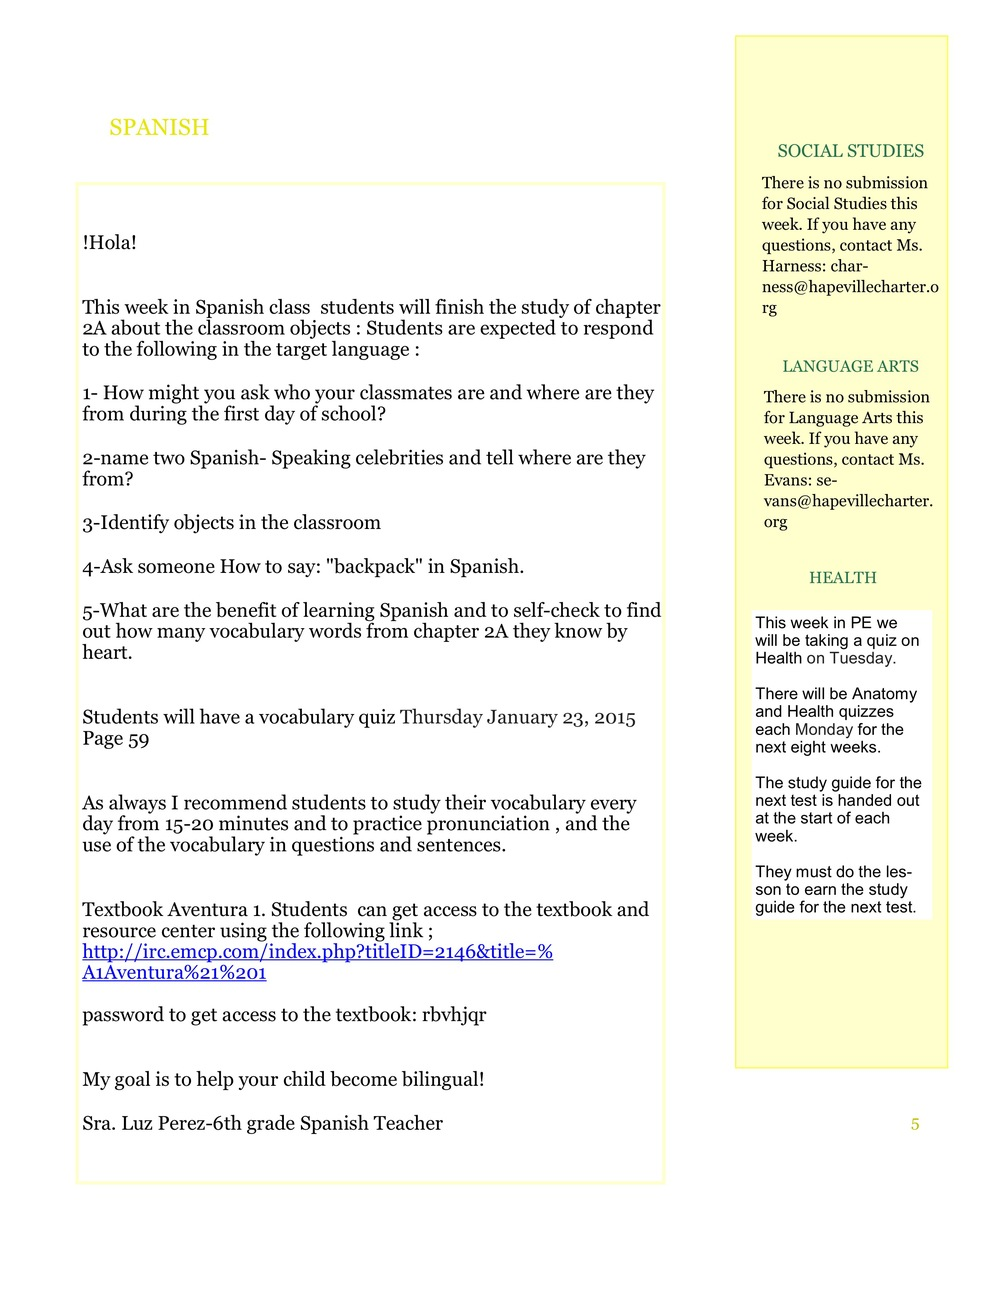 Newsletter Image6th grade January 20-23 5.jpeg